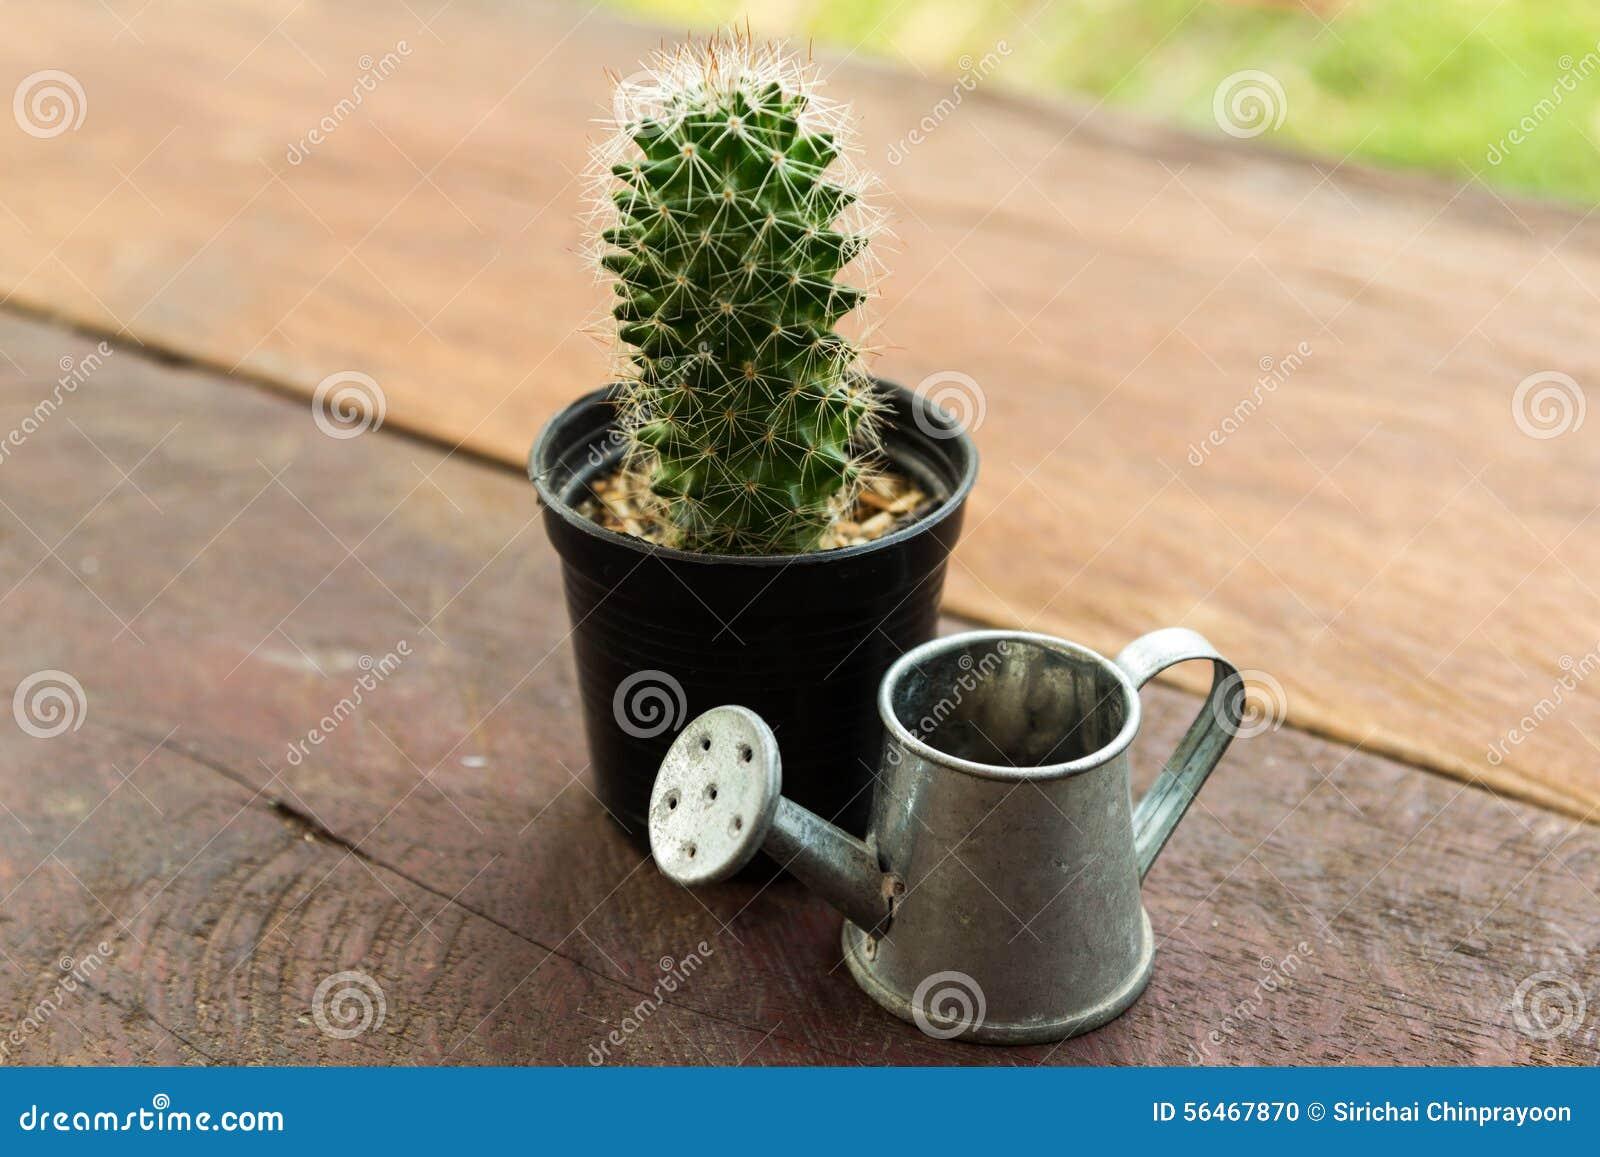 arrosage jeune cactus. Black Bedroom Furniture Sets. Home Design Ideas